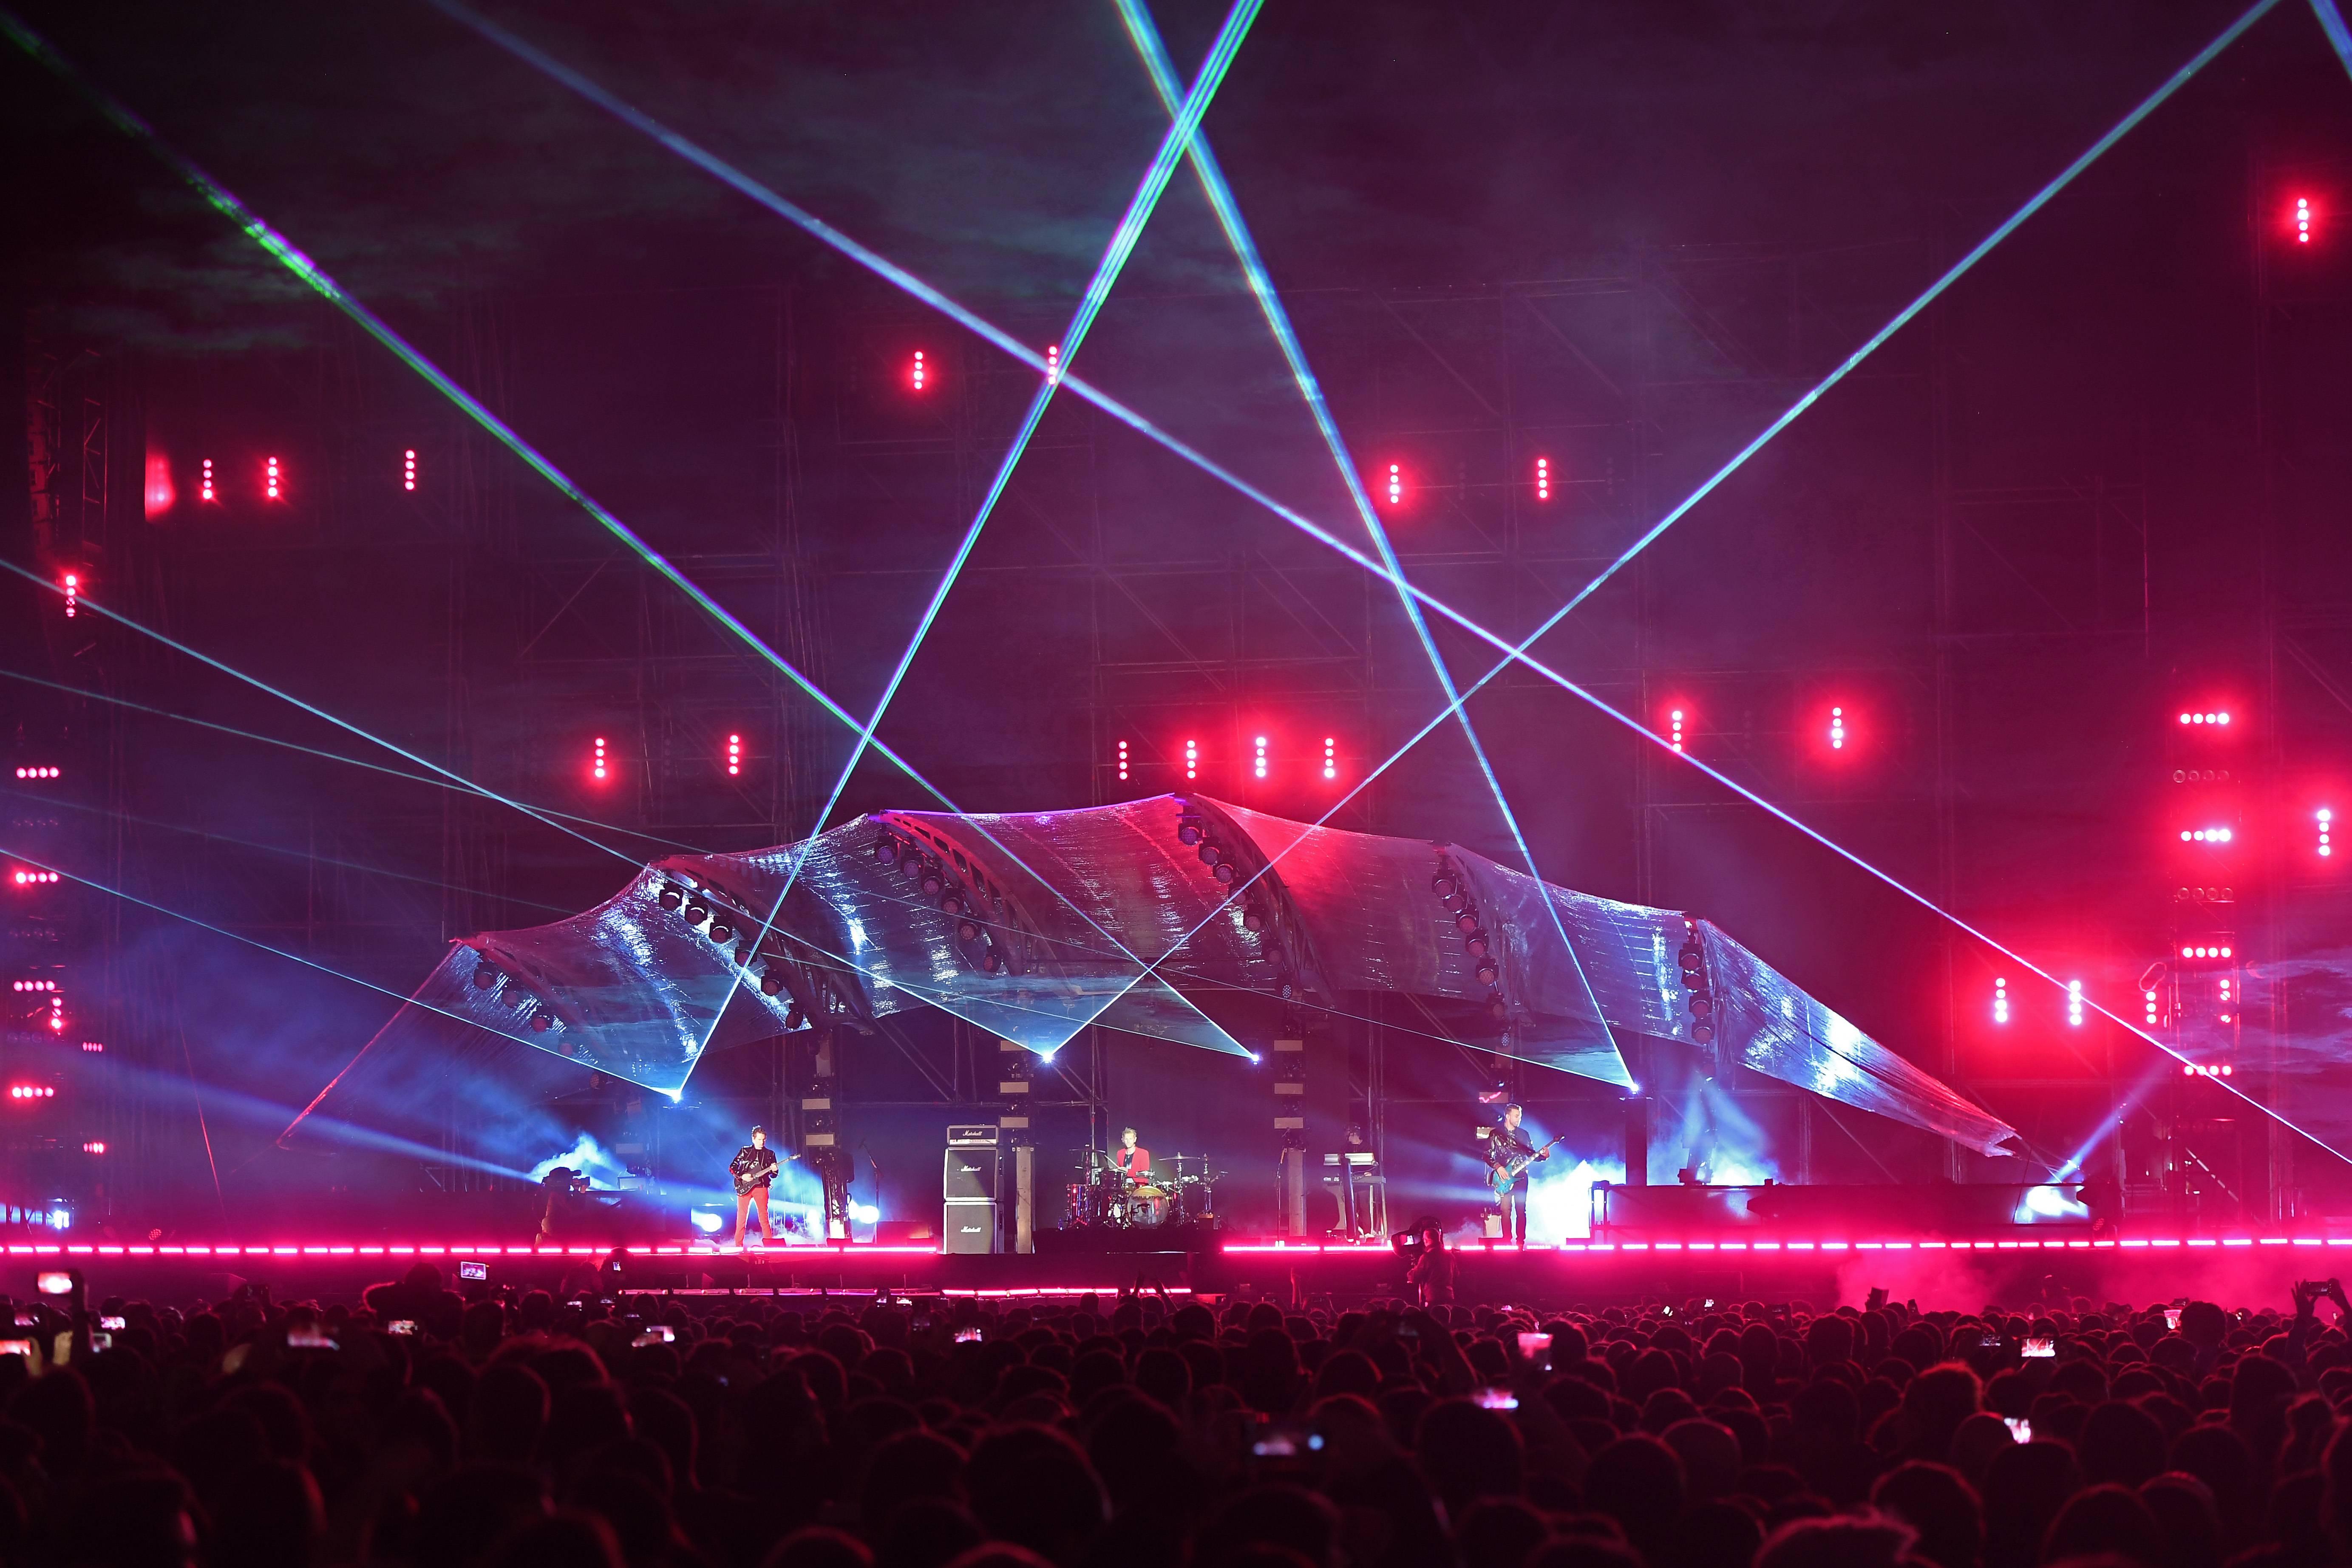 mgid:file:gsp:scenic:/international/mtv.es/images/Muse_-_MTV_World_Stage_-_MTV_EMAs_Bilbao_2018_-_25.JPG